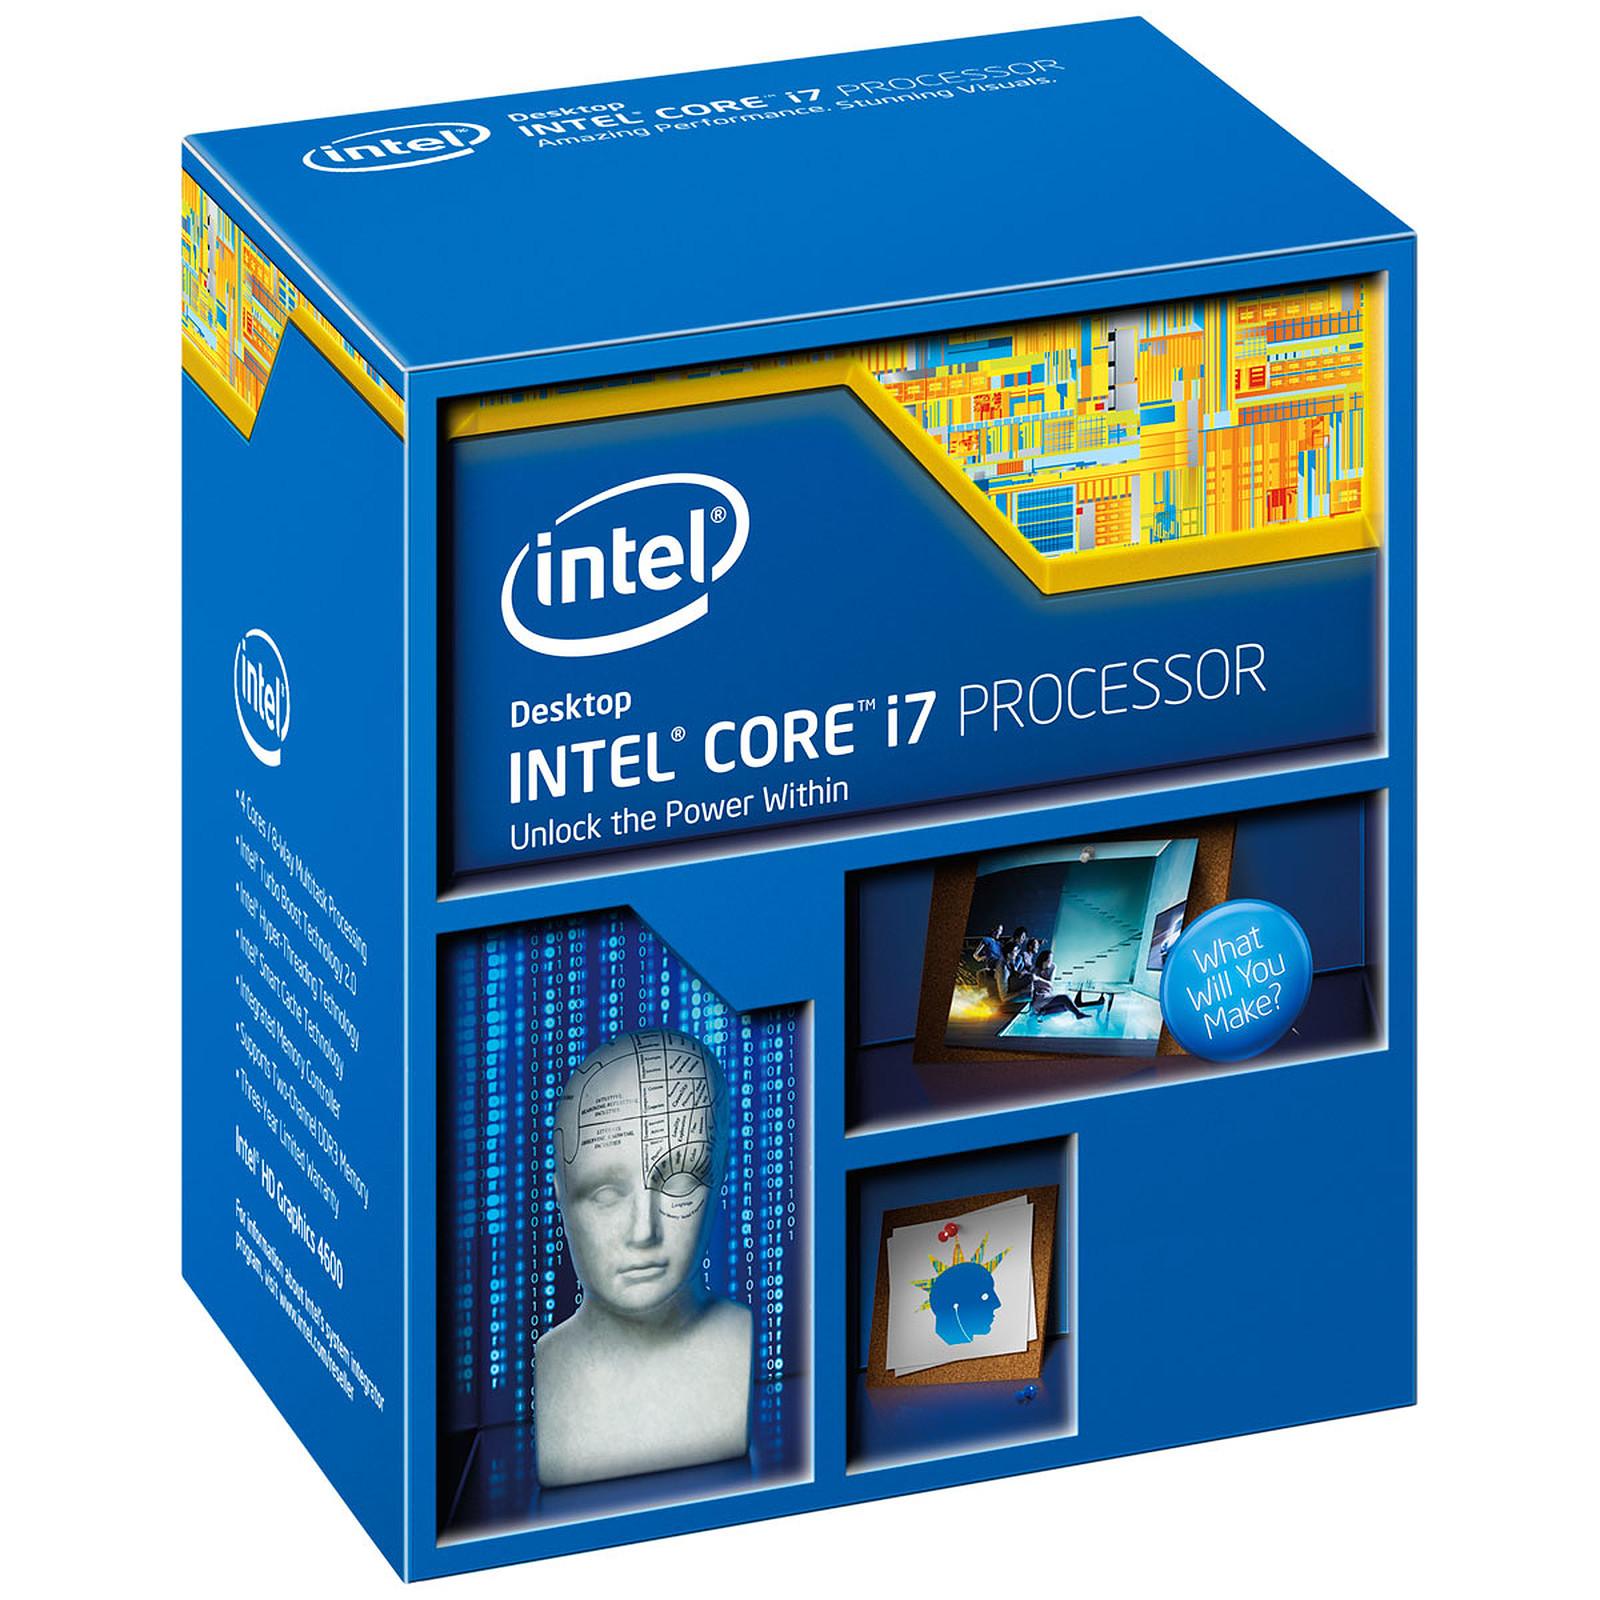 Intel Core i7-4790K (4.0 GHz)